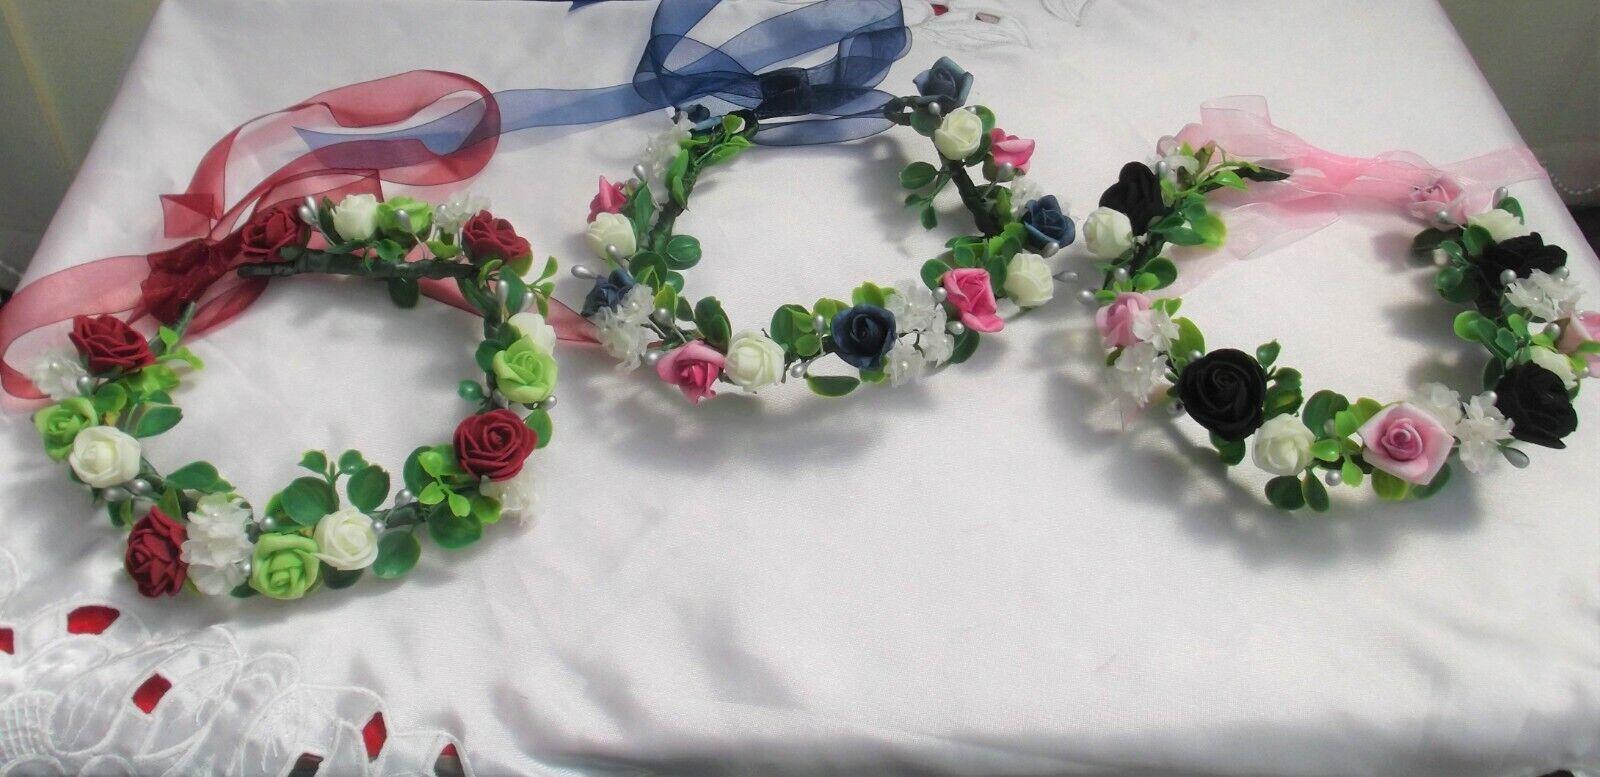 Flower Circlet - Ivory + Burgundy/Green/Silver; Black/Pink/Silver; Navy/Fuchsia